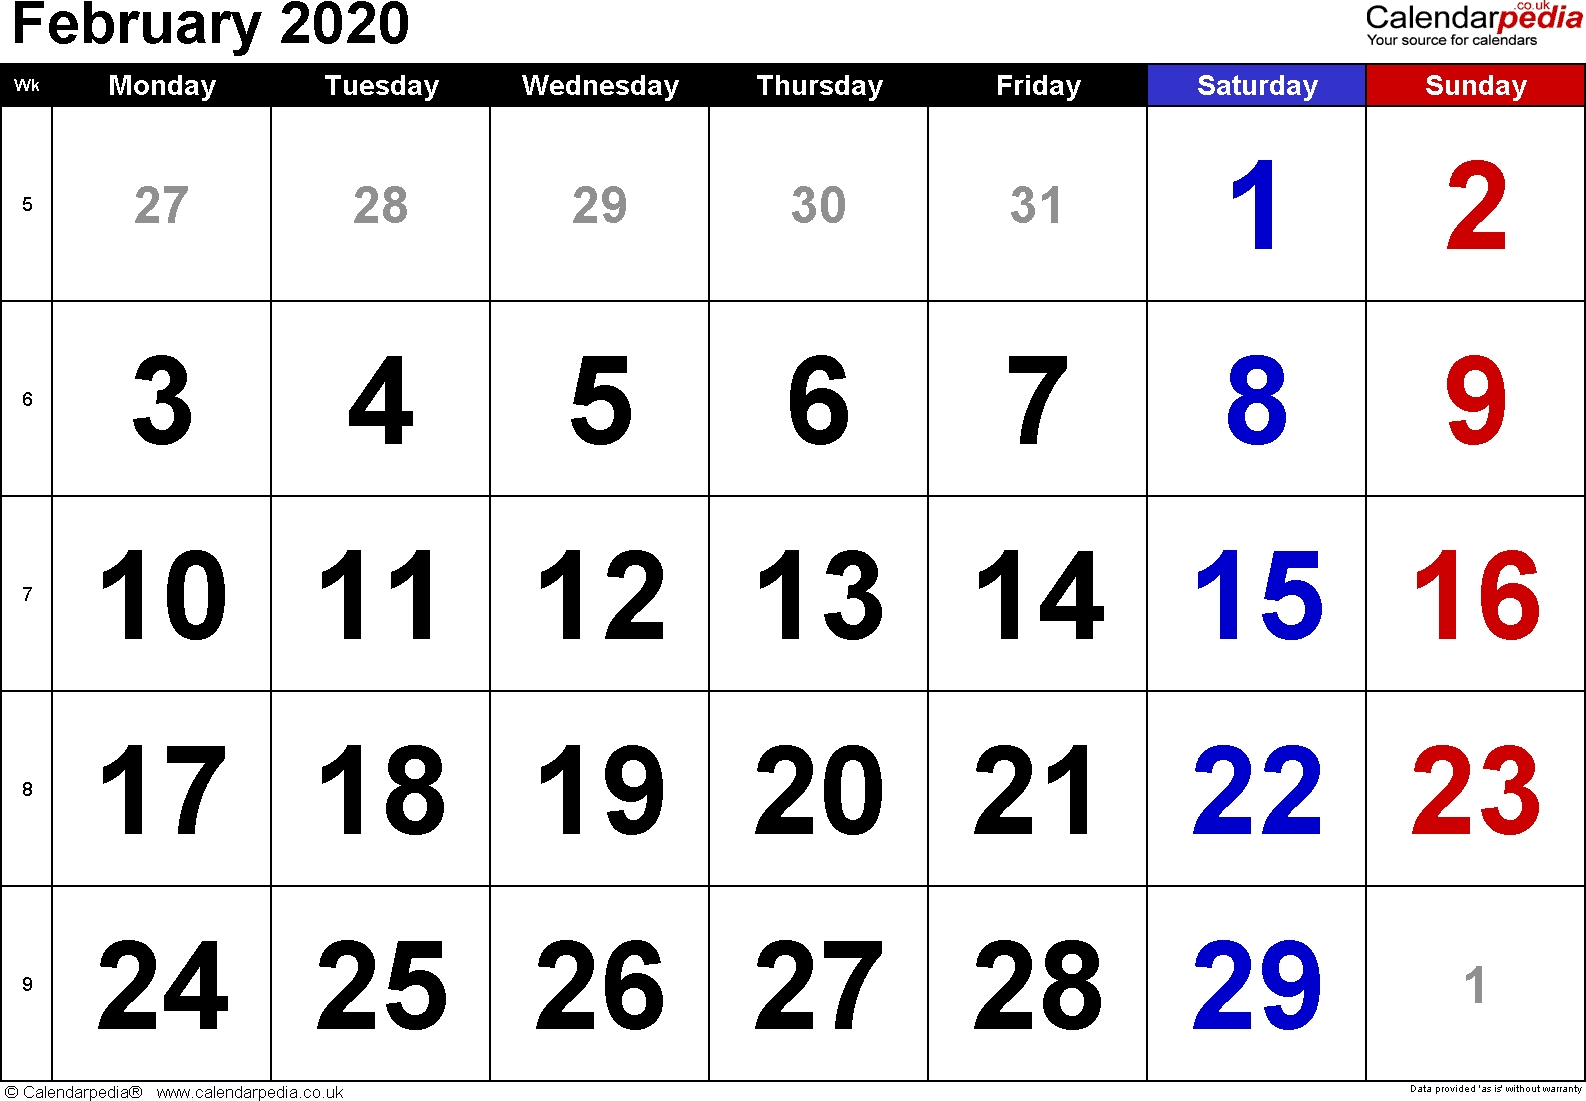 Calendar February 2020 Uk, Bank Holidays, Excel/pdf/word